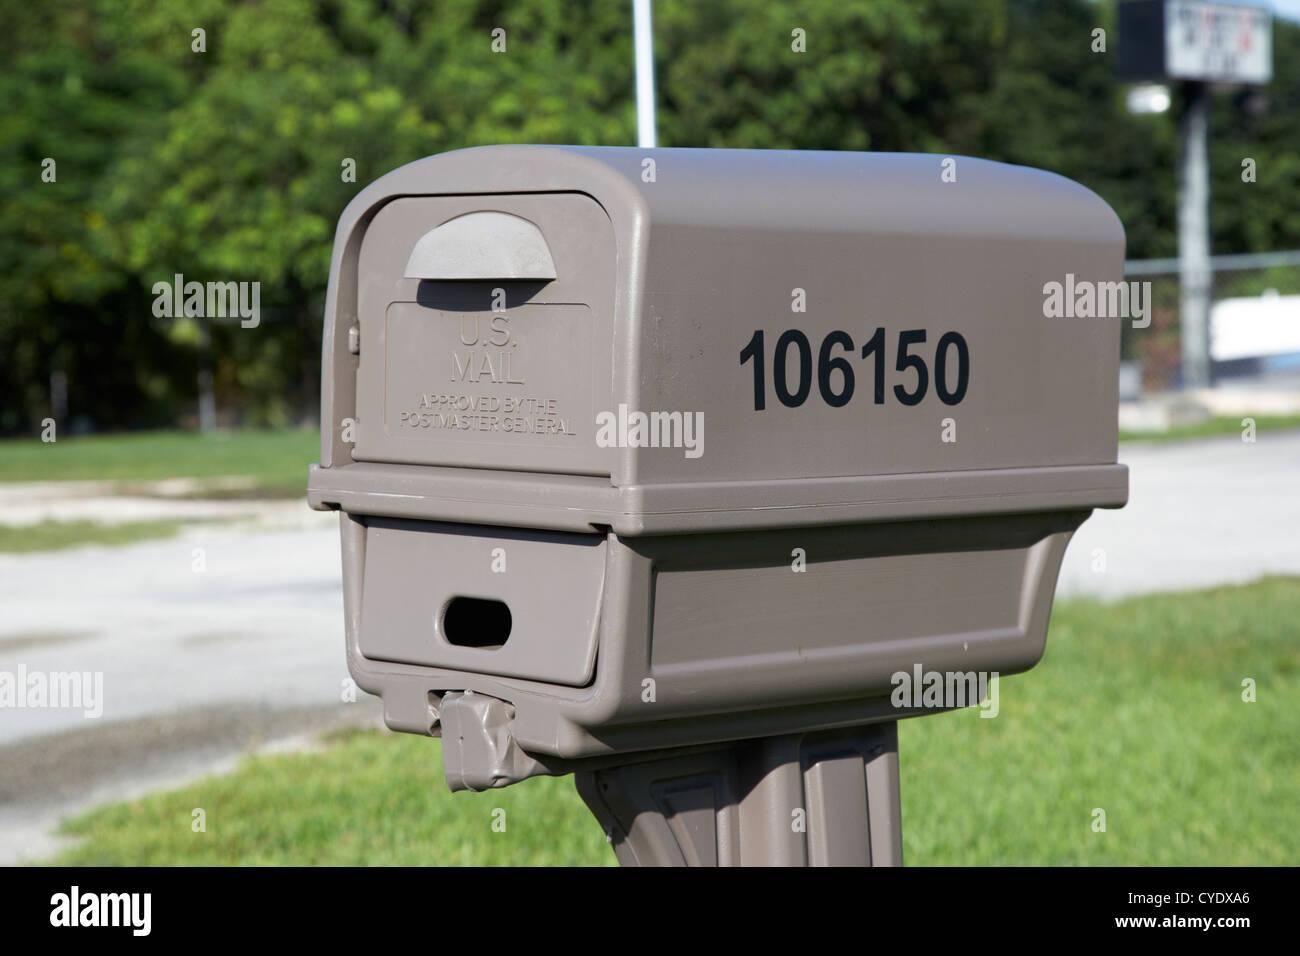 billiges Plastik U.S. mail doppelt Postfach usa Stockbild